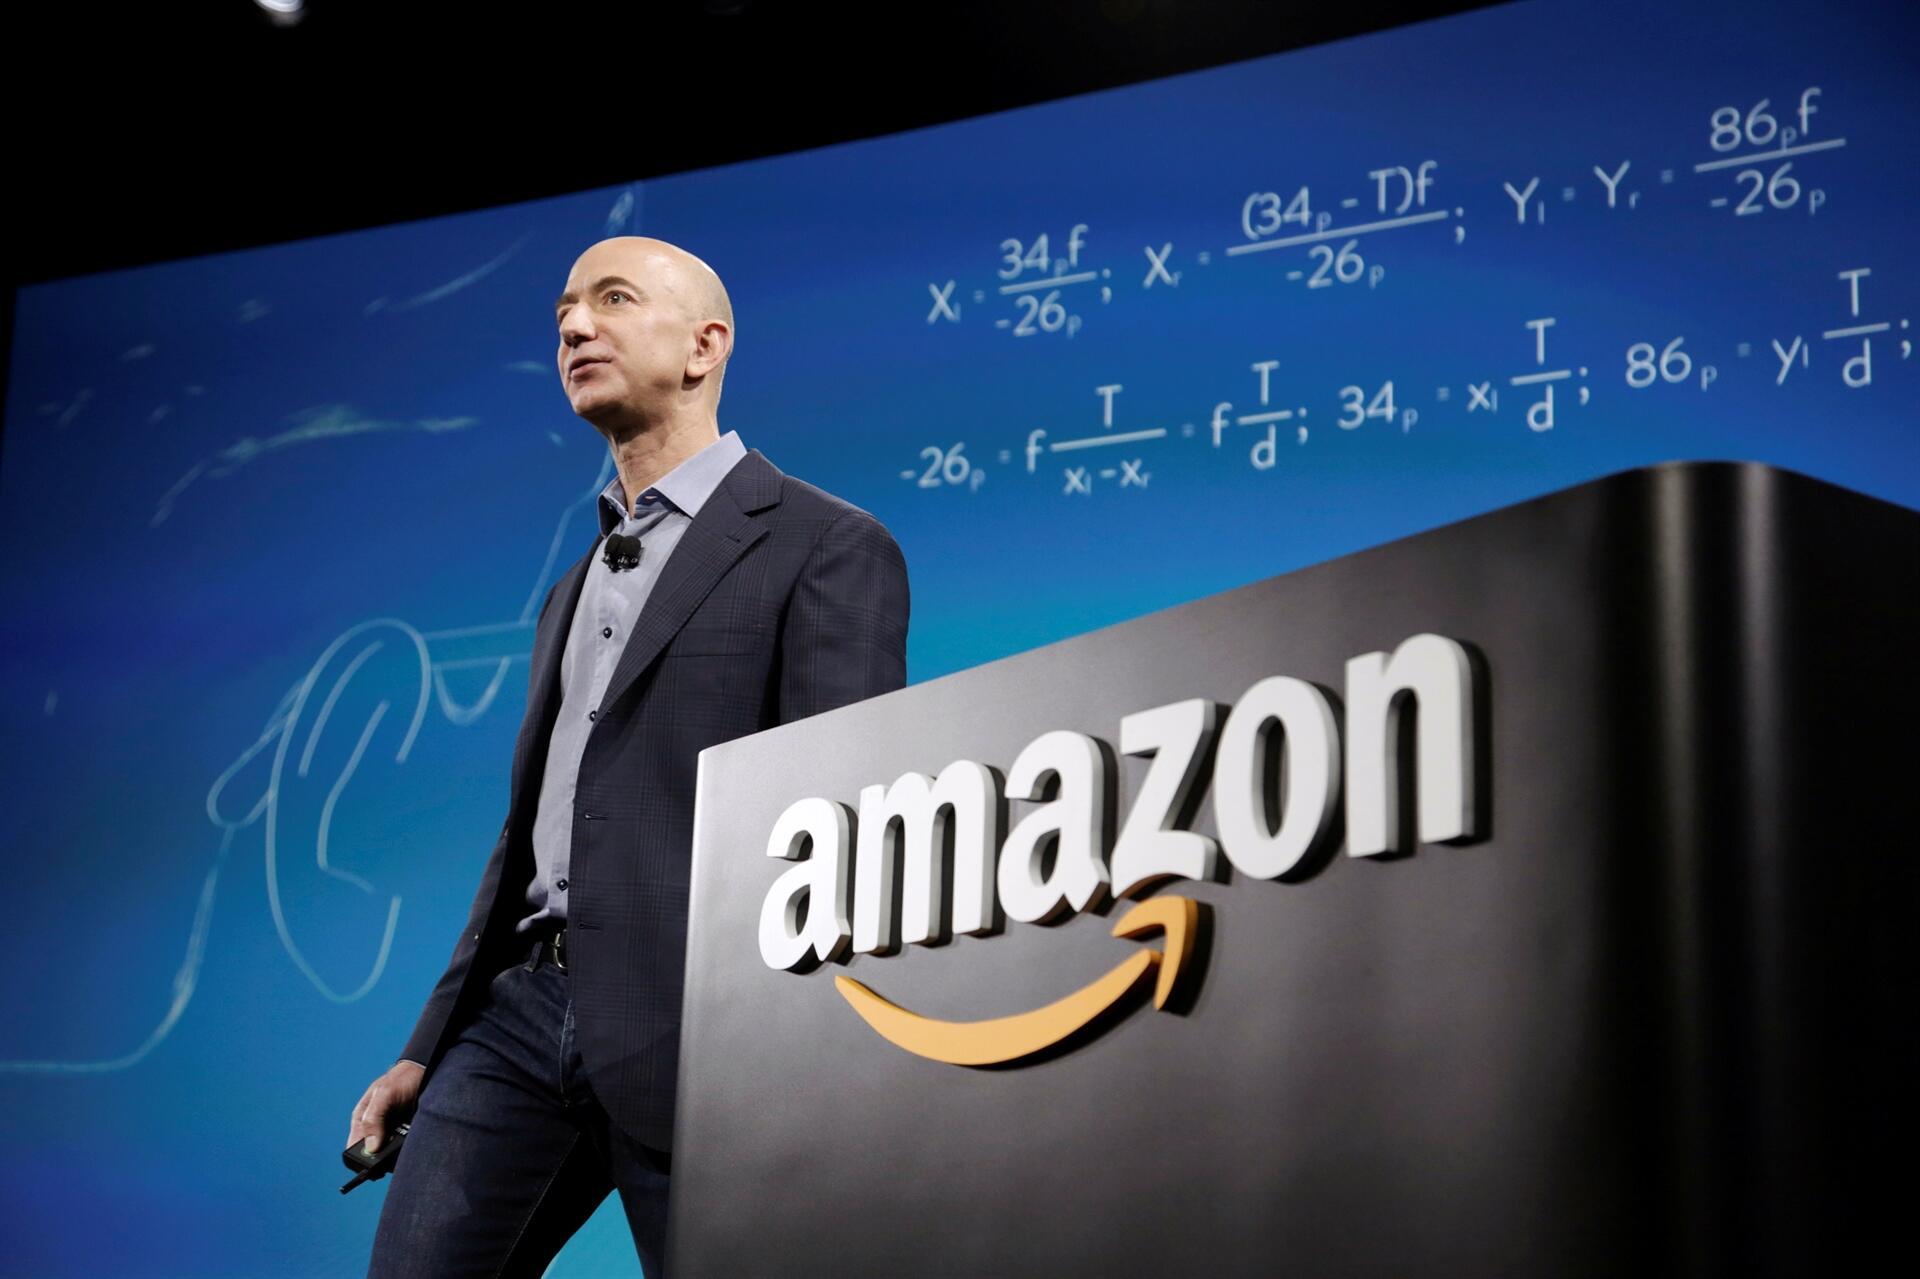 jeff bezos – What's Lauren Sanchez net worth now after the relationship with Jeff Bezos?